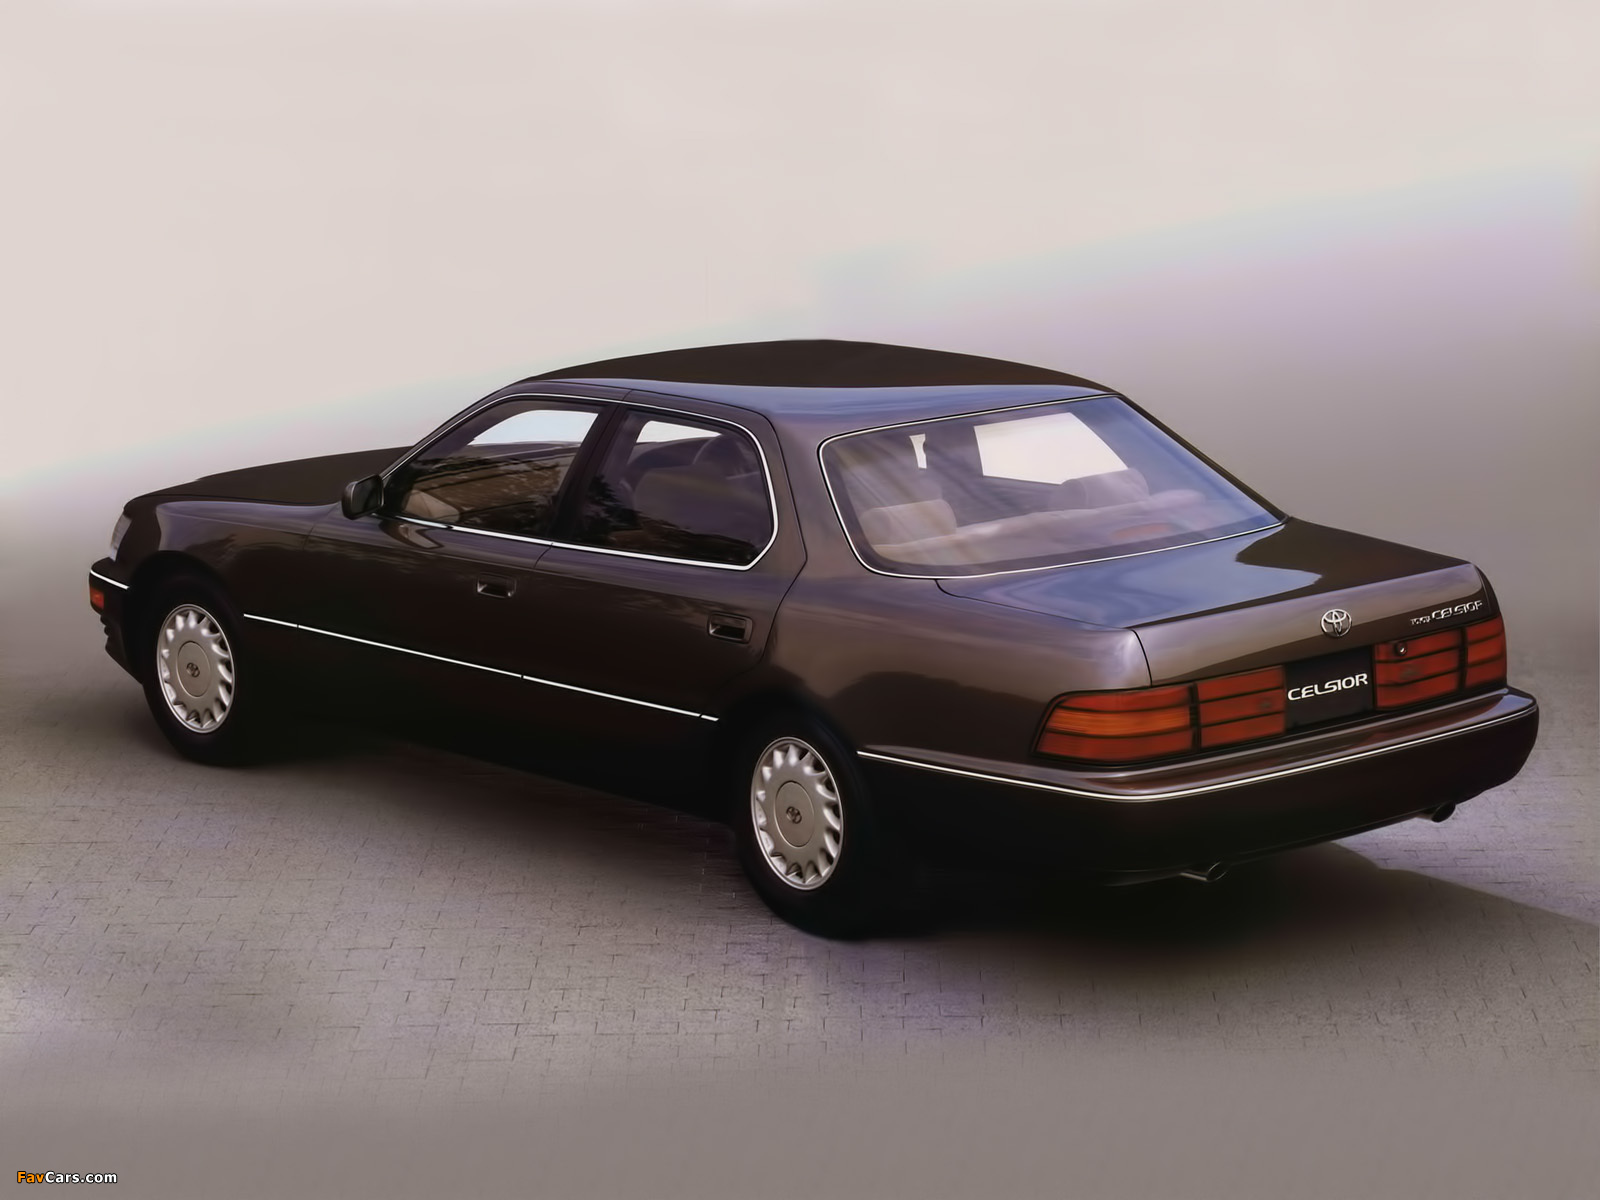 Images Of Toyota Celsior Ucf11 1989 94 1600x1200